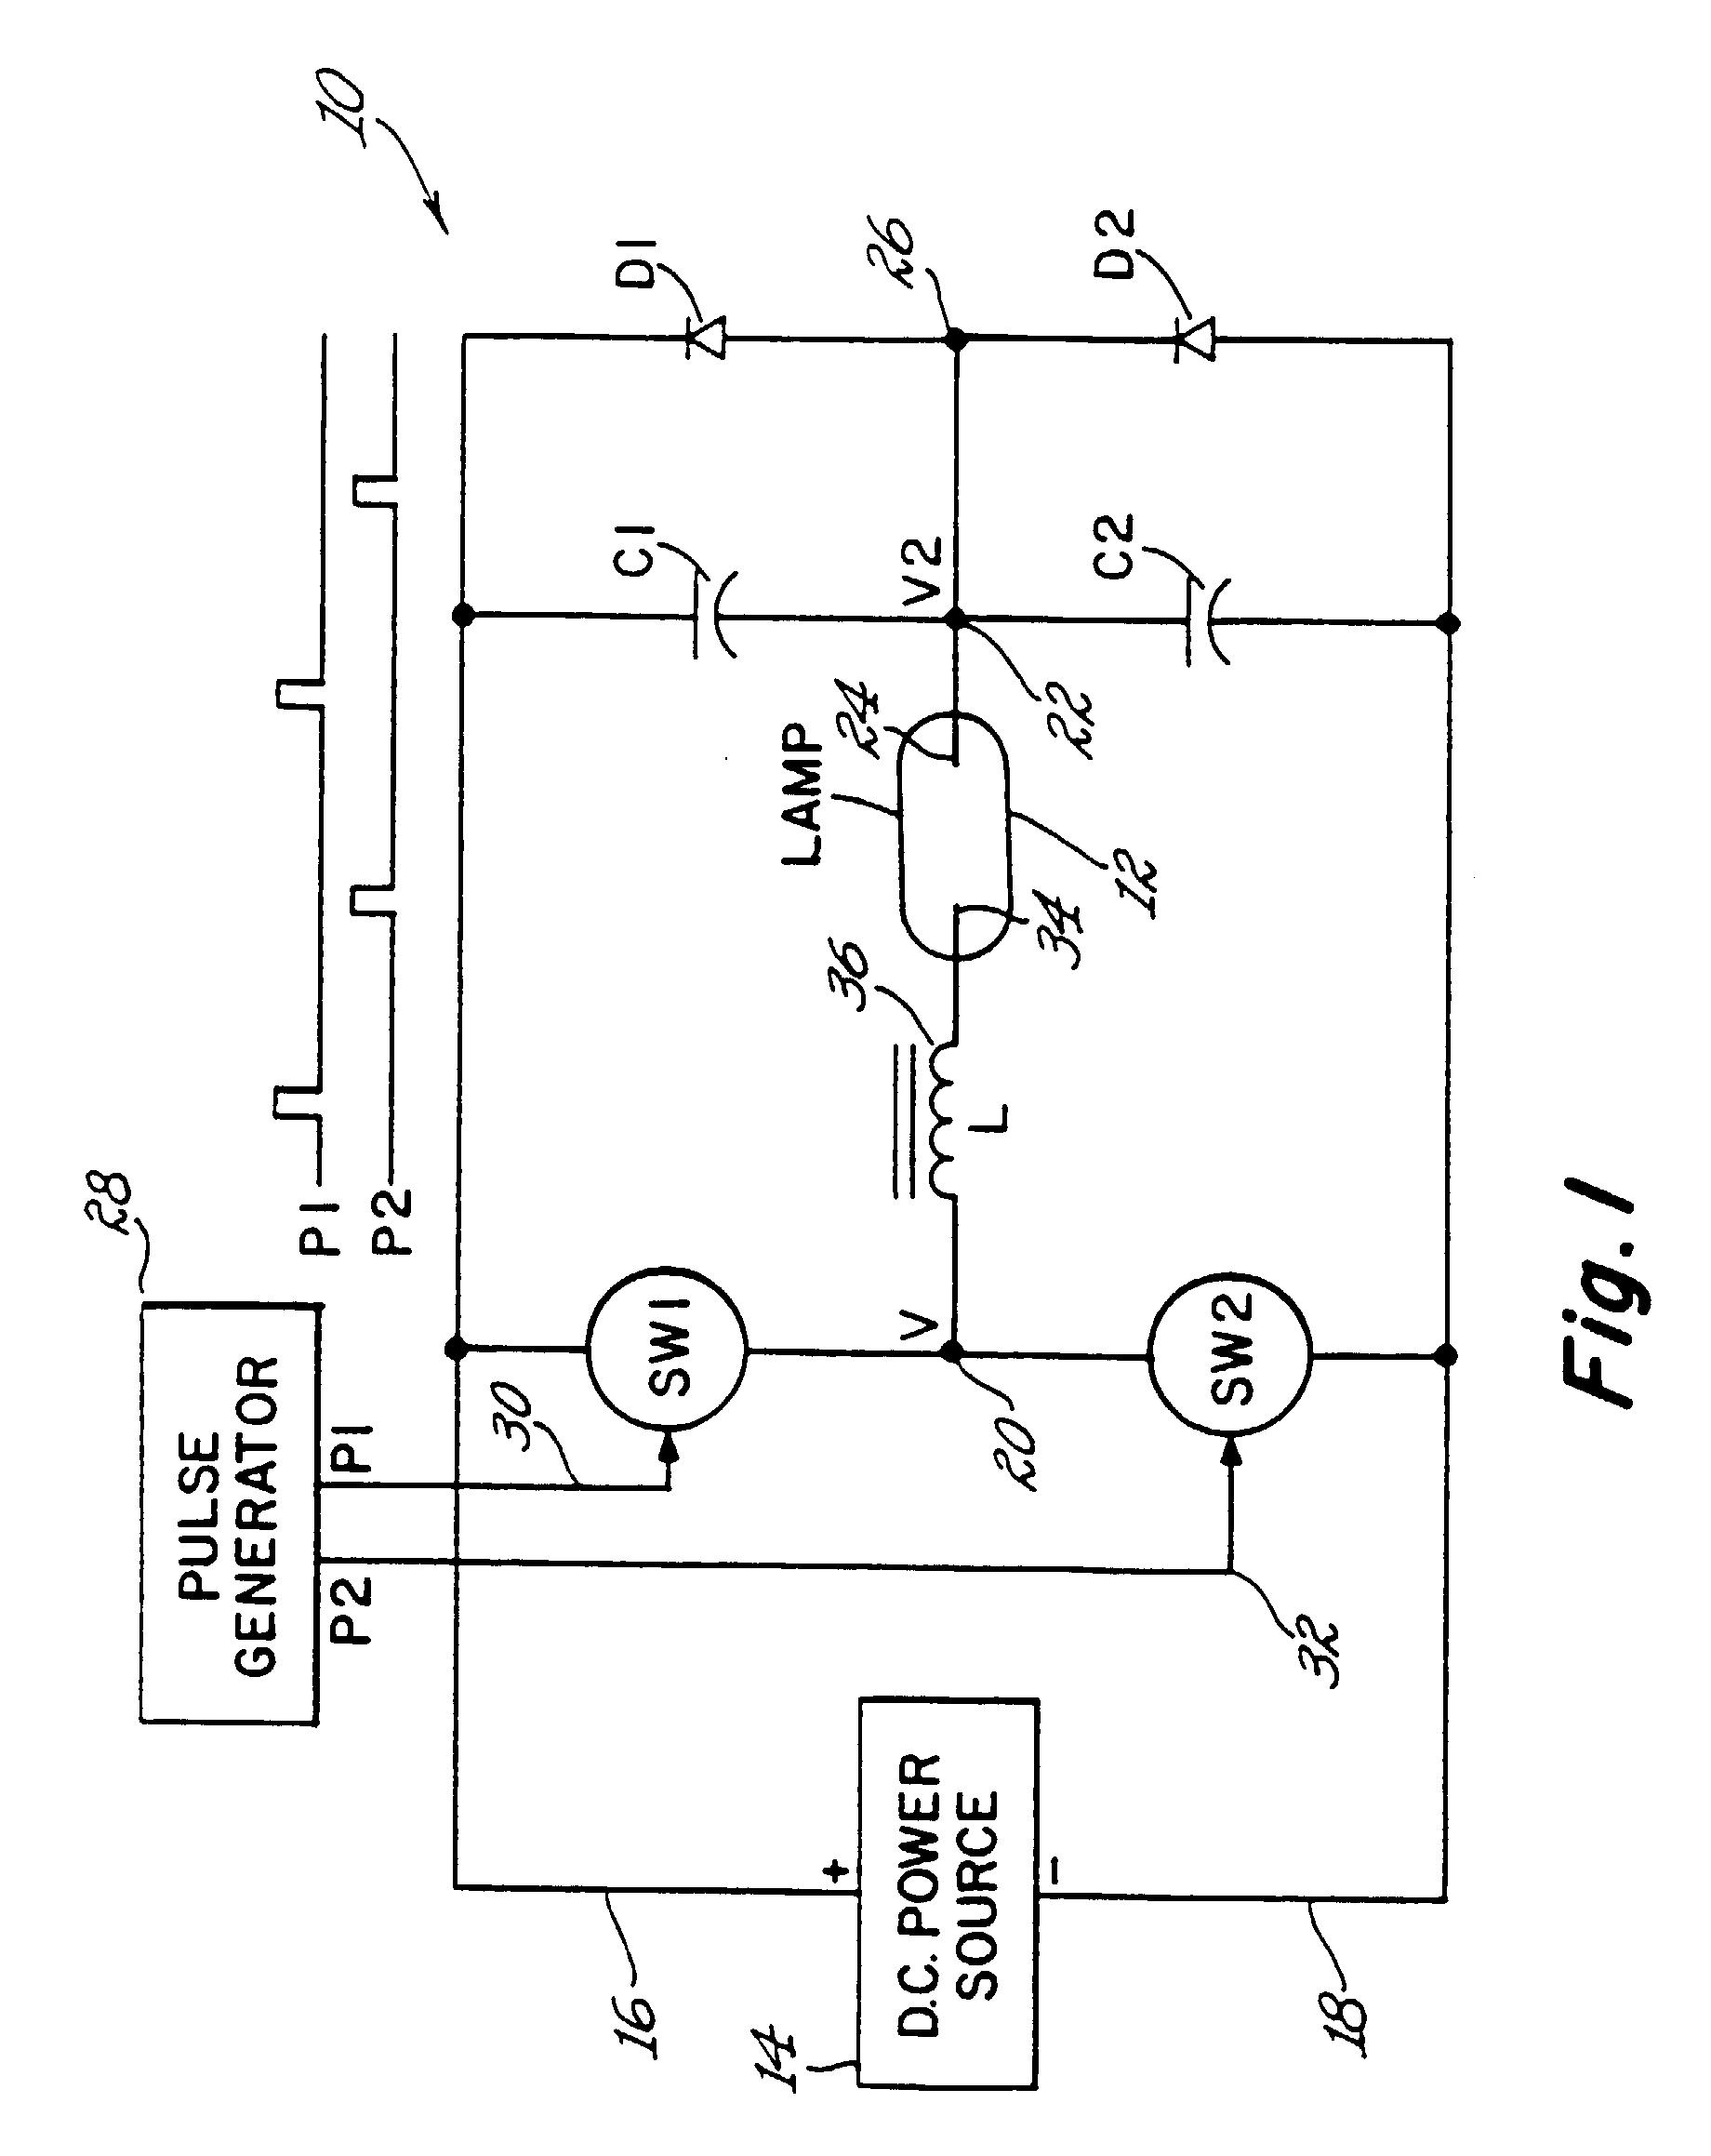 Sodium Outdoor Lights Wiring Diagram